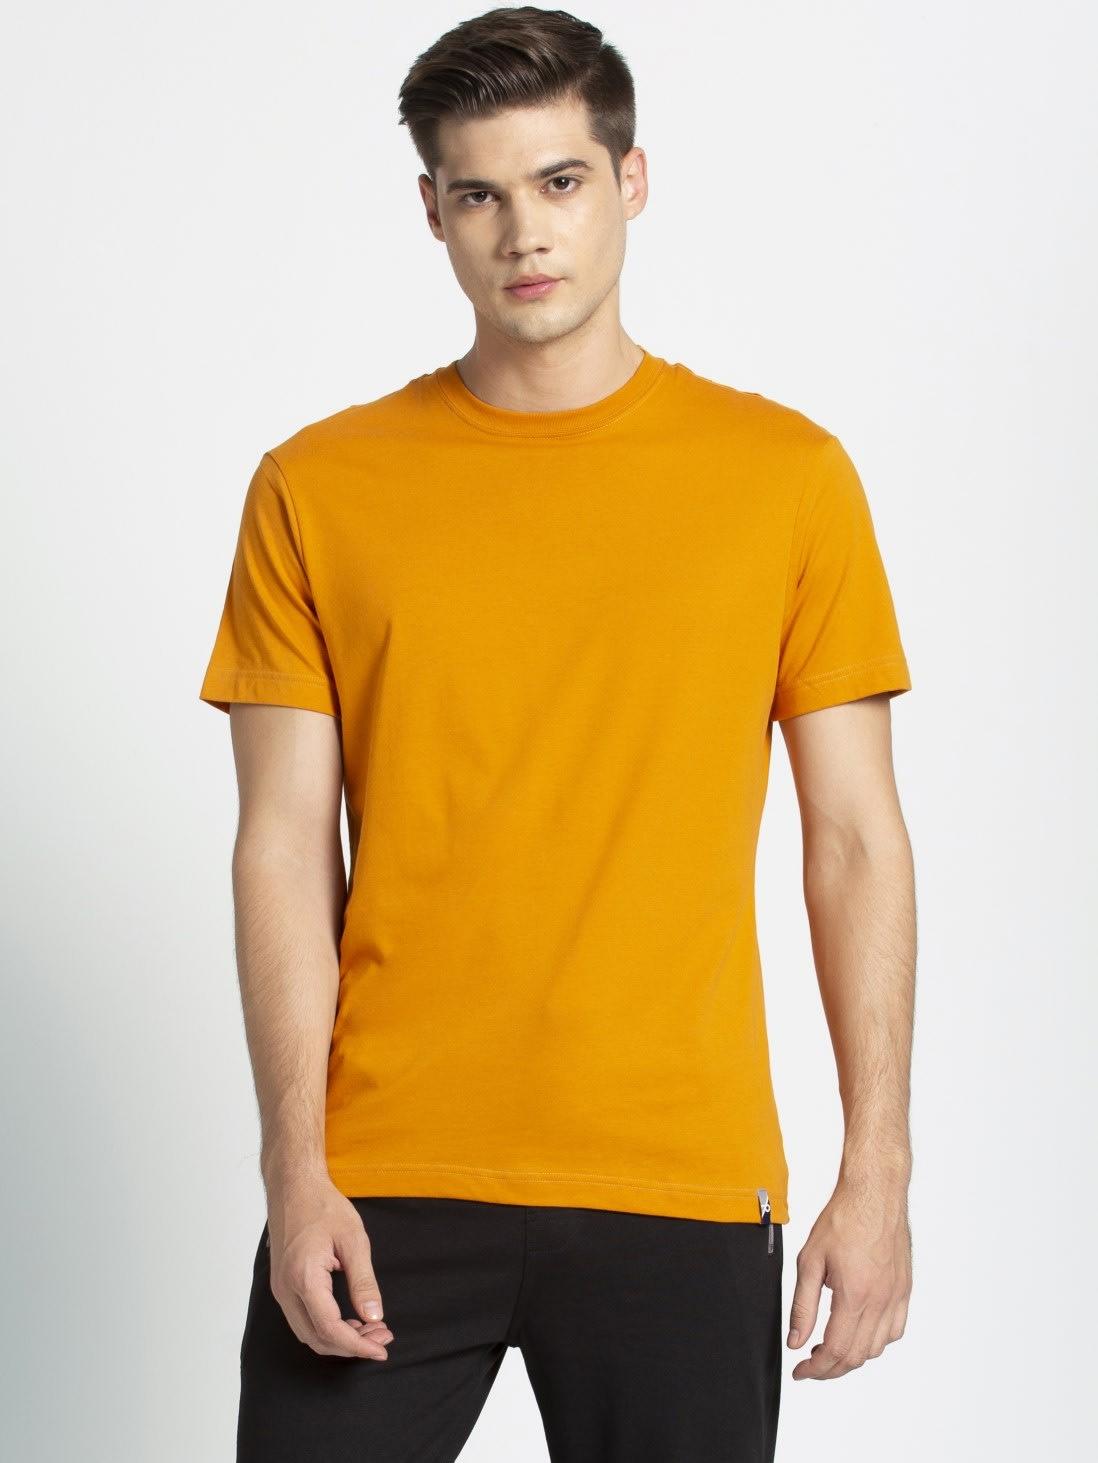 Men's Round Neck T-shirt -Free Sewing Pattern (Sizes S-XXL)